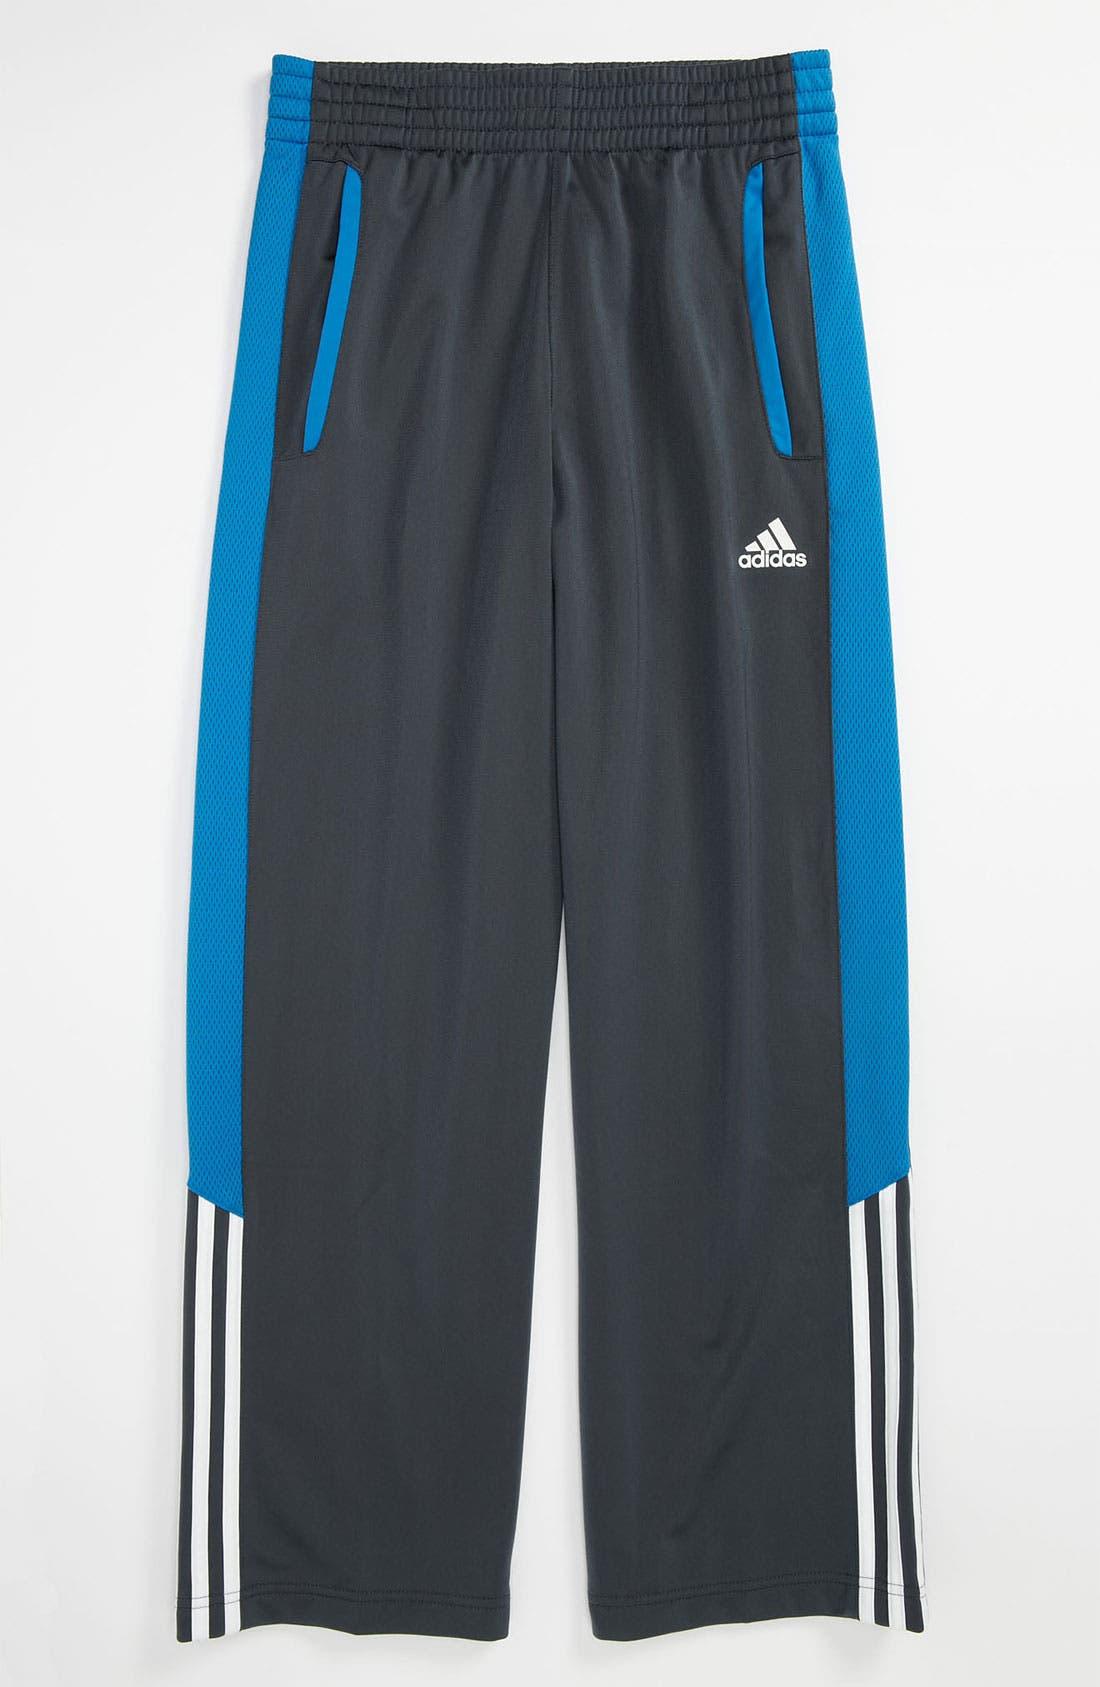 Main Image - adidas 'Pro Model' Pants (Big Boys)